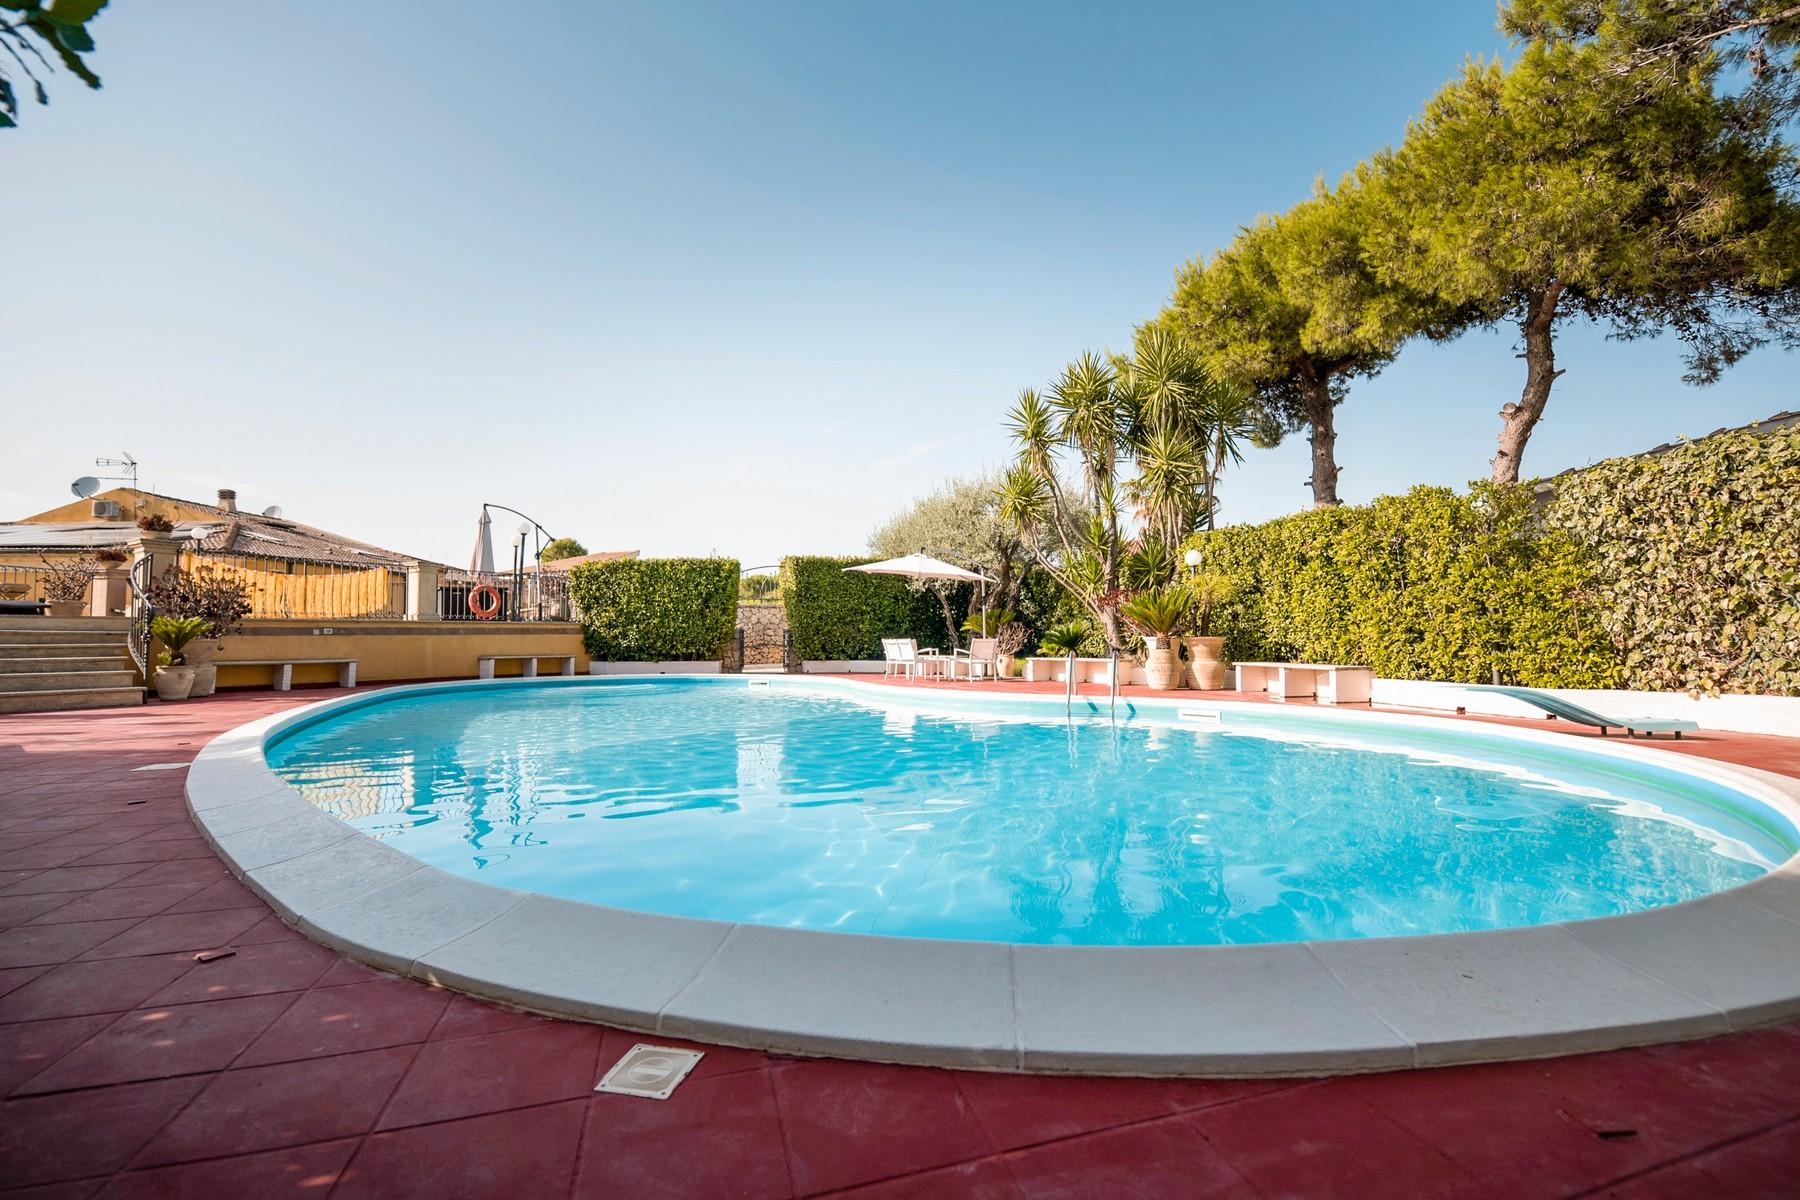 Casa indipendente in Vendita a Noto: 5 locali, 300 mq - Foto 4